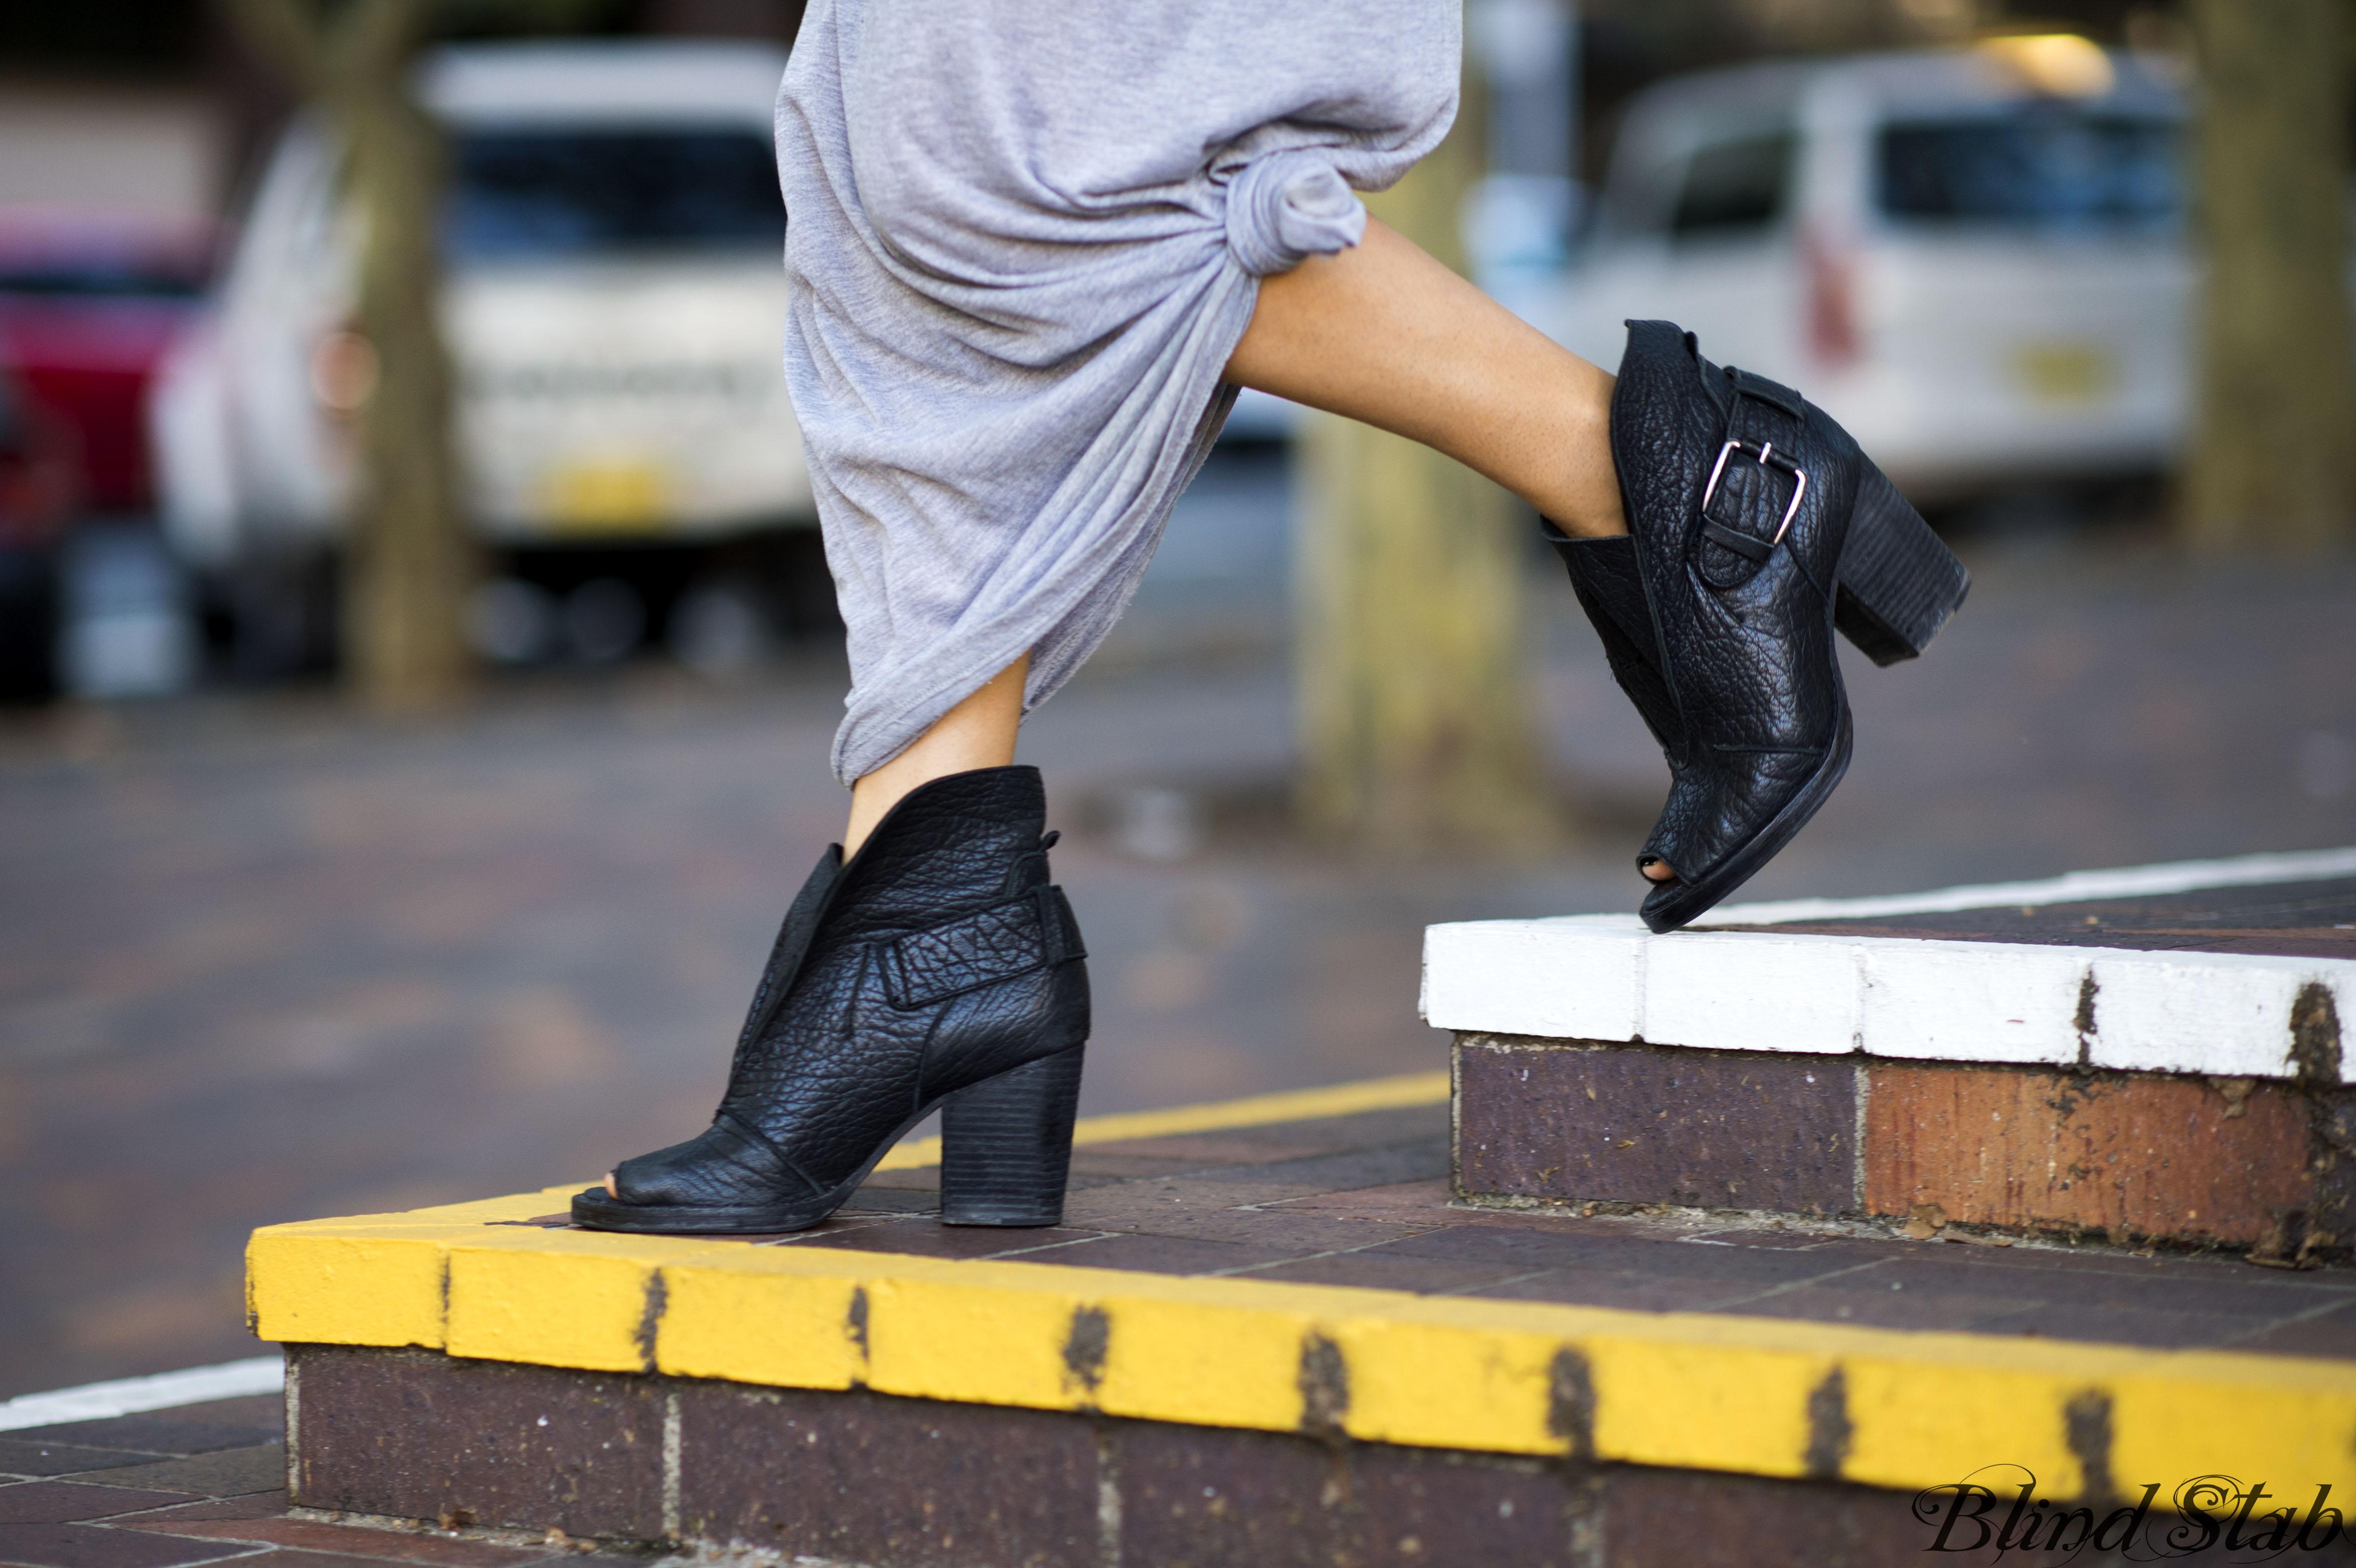 Blind Stab Dana Suchow Sydney Fashion Week Spring Black Wide Brim Hat 4